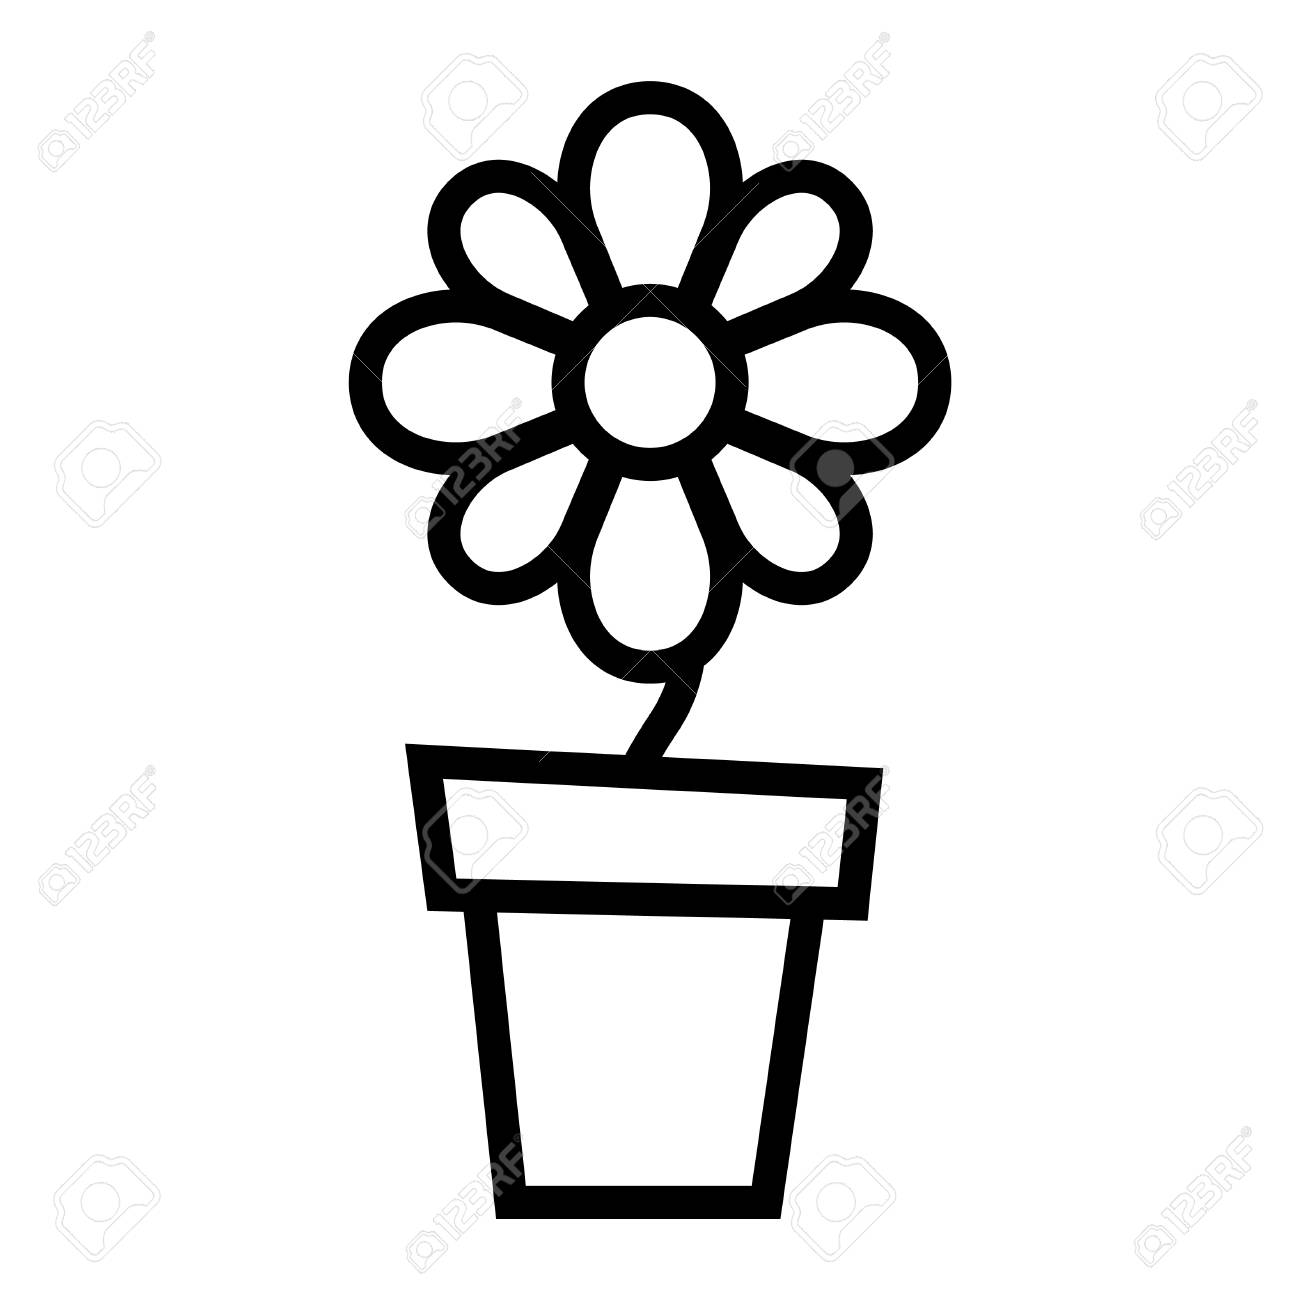 Black And White Flower Pot Clipart.